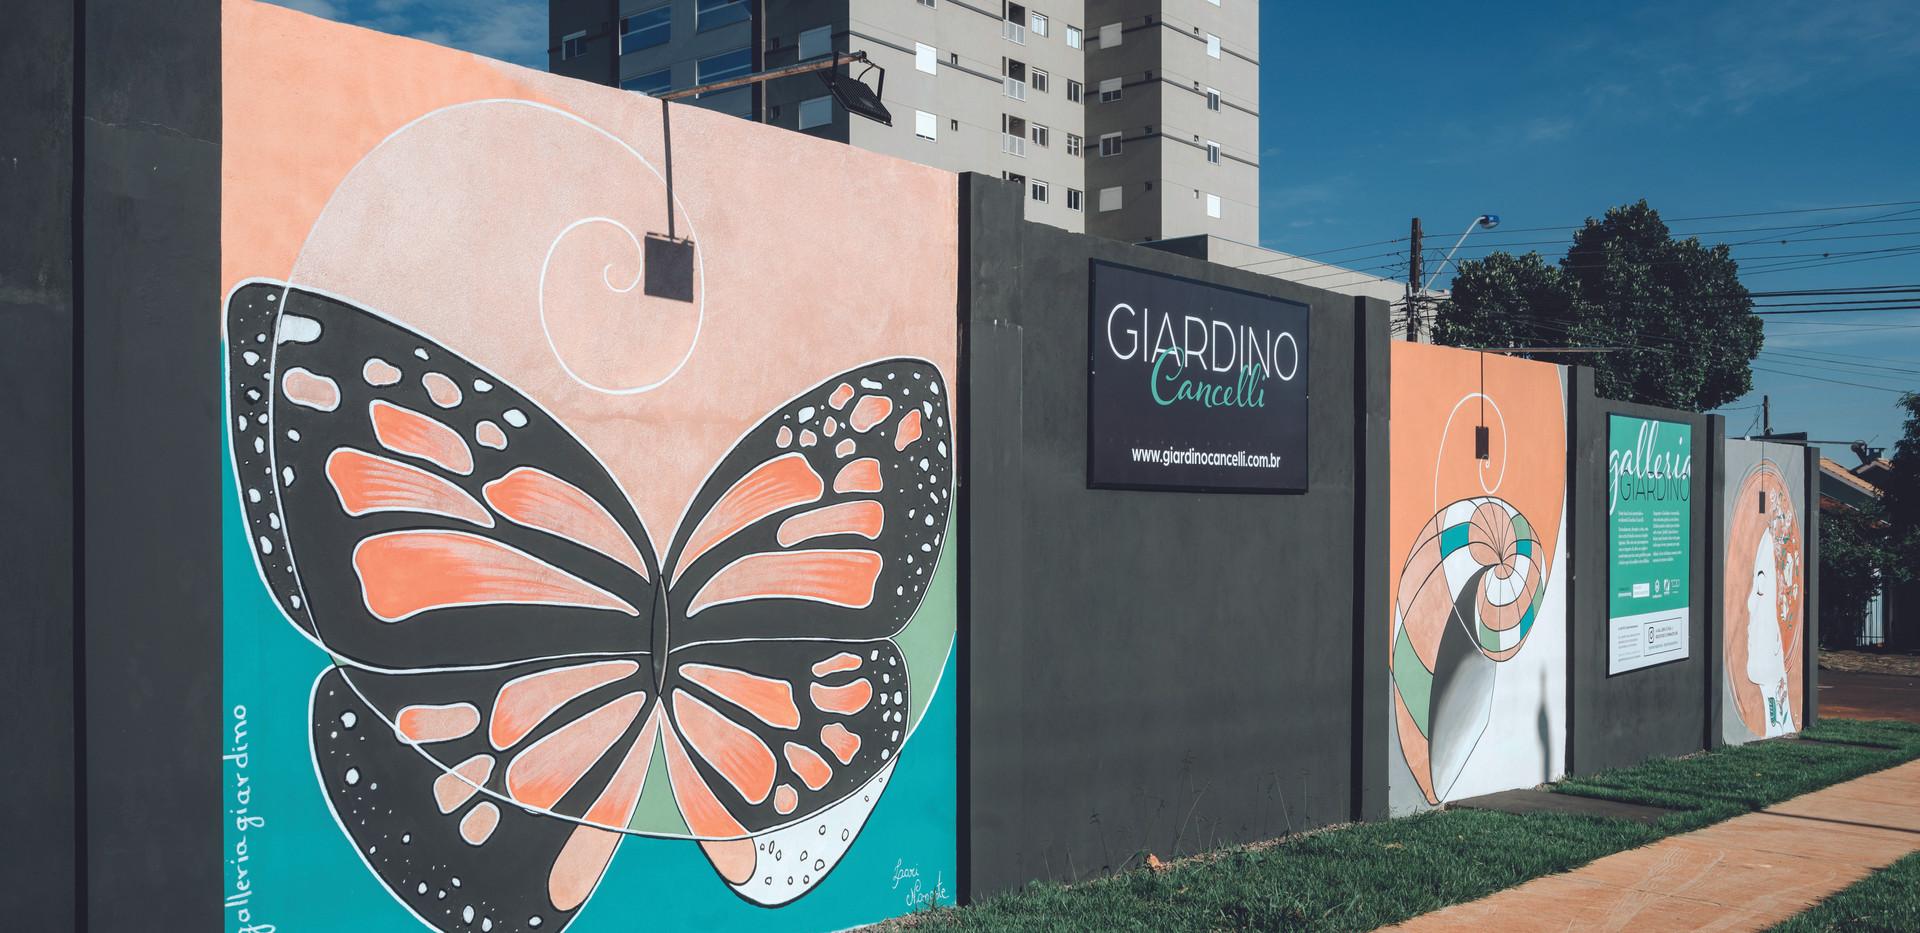 Galleria Giardino